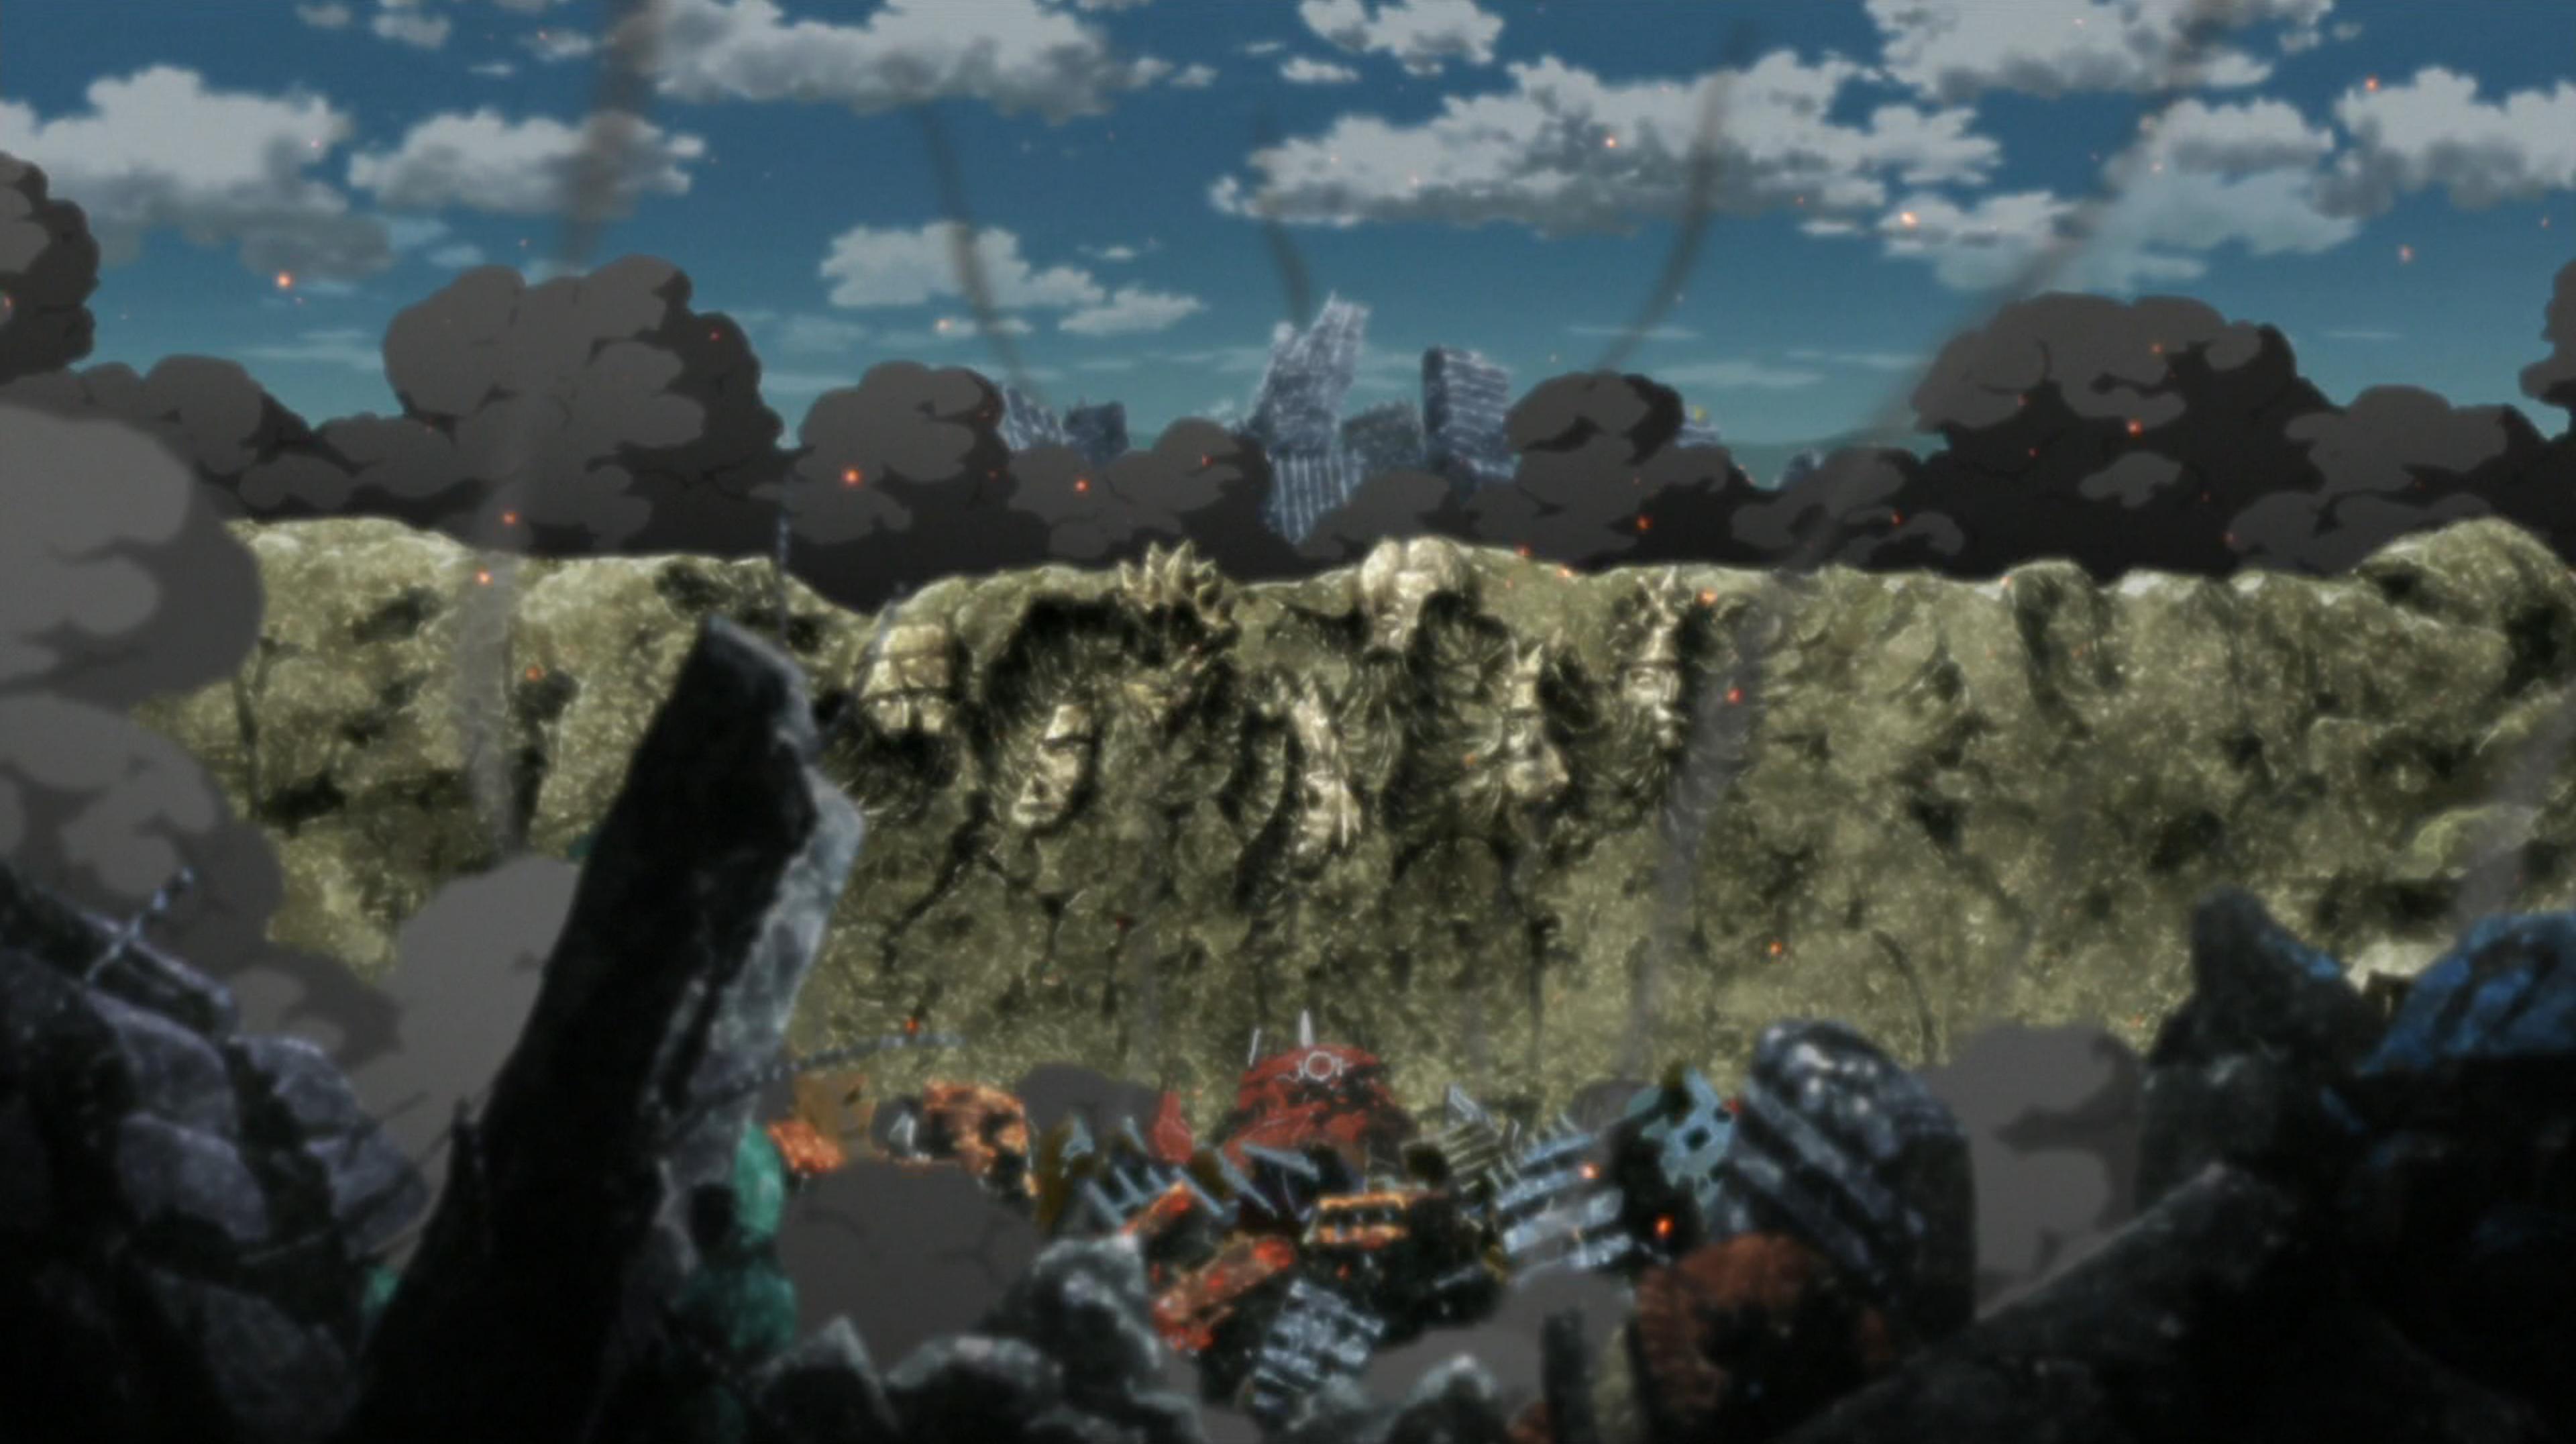 Konohagakure narutopedia fandom powered by wikia konoha destroyed again biocorpaavc Image collections